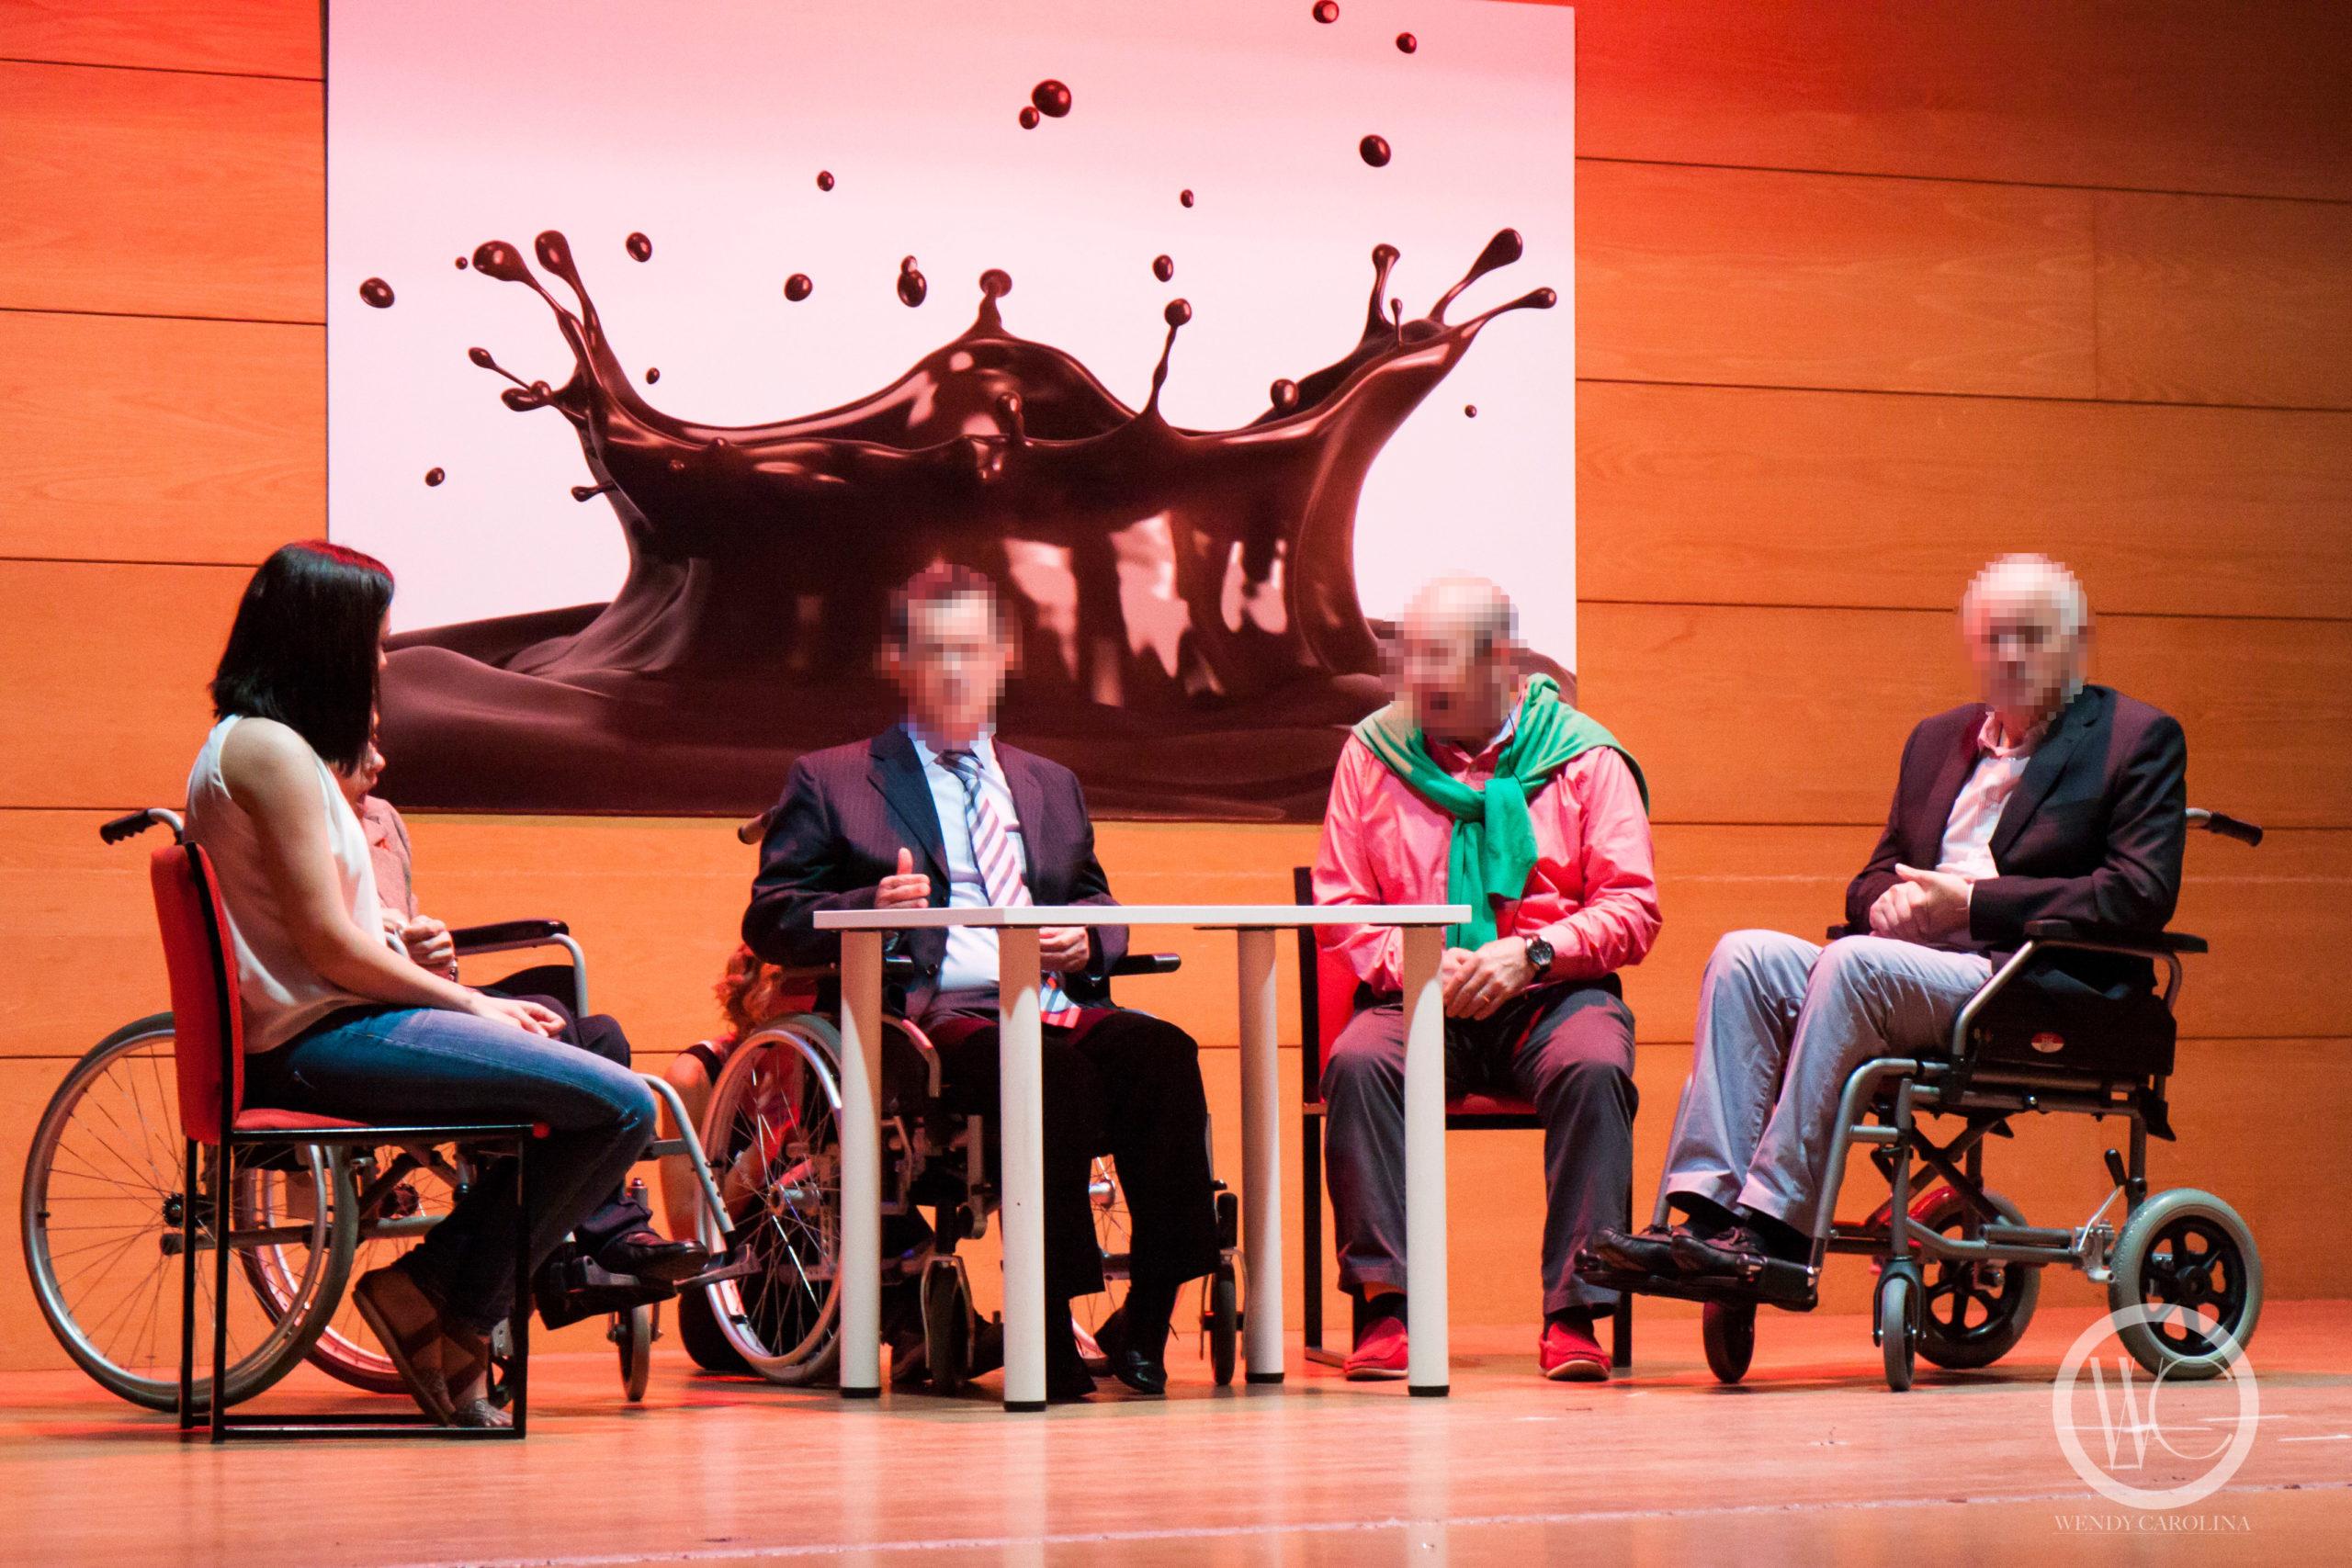 AsociaciónDanoCerebralSarela_TeatroSarela_02